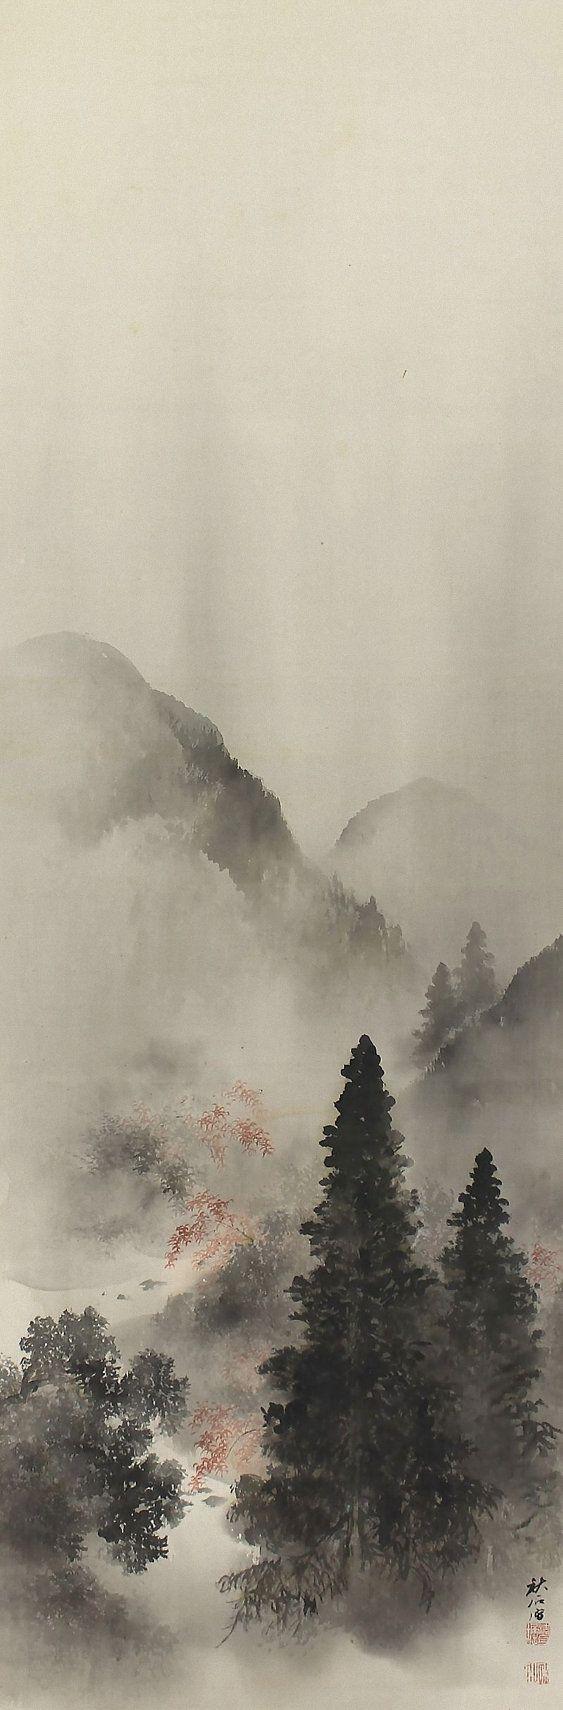 Autumn landscape by okutani shuseki 1871 1936 japanese for Japanese watercolor paintings